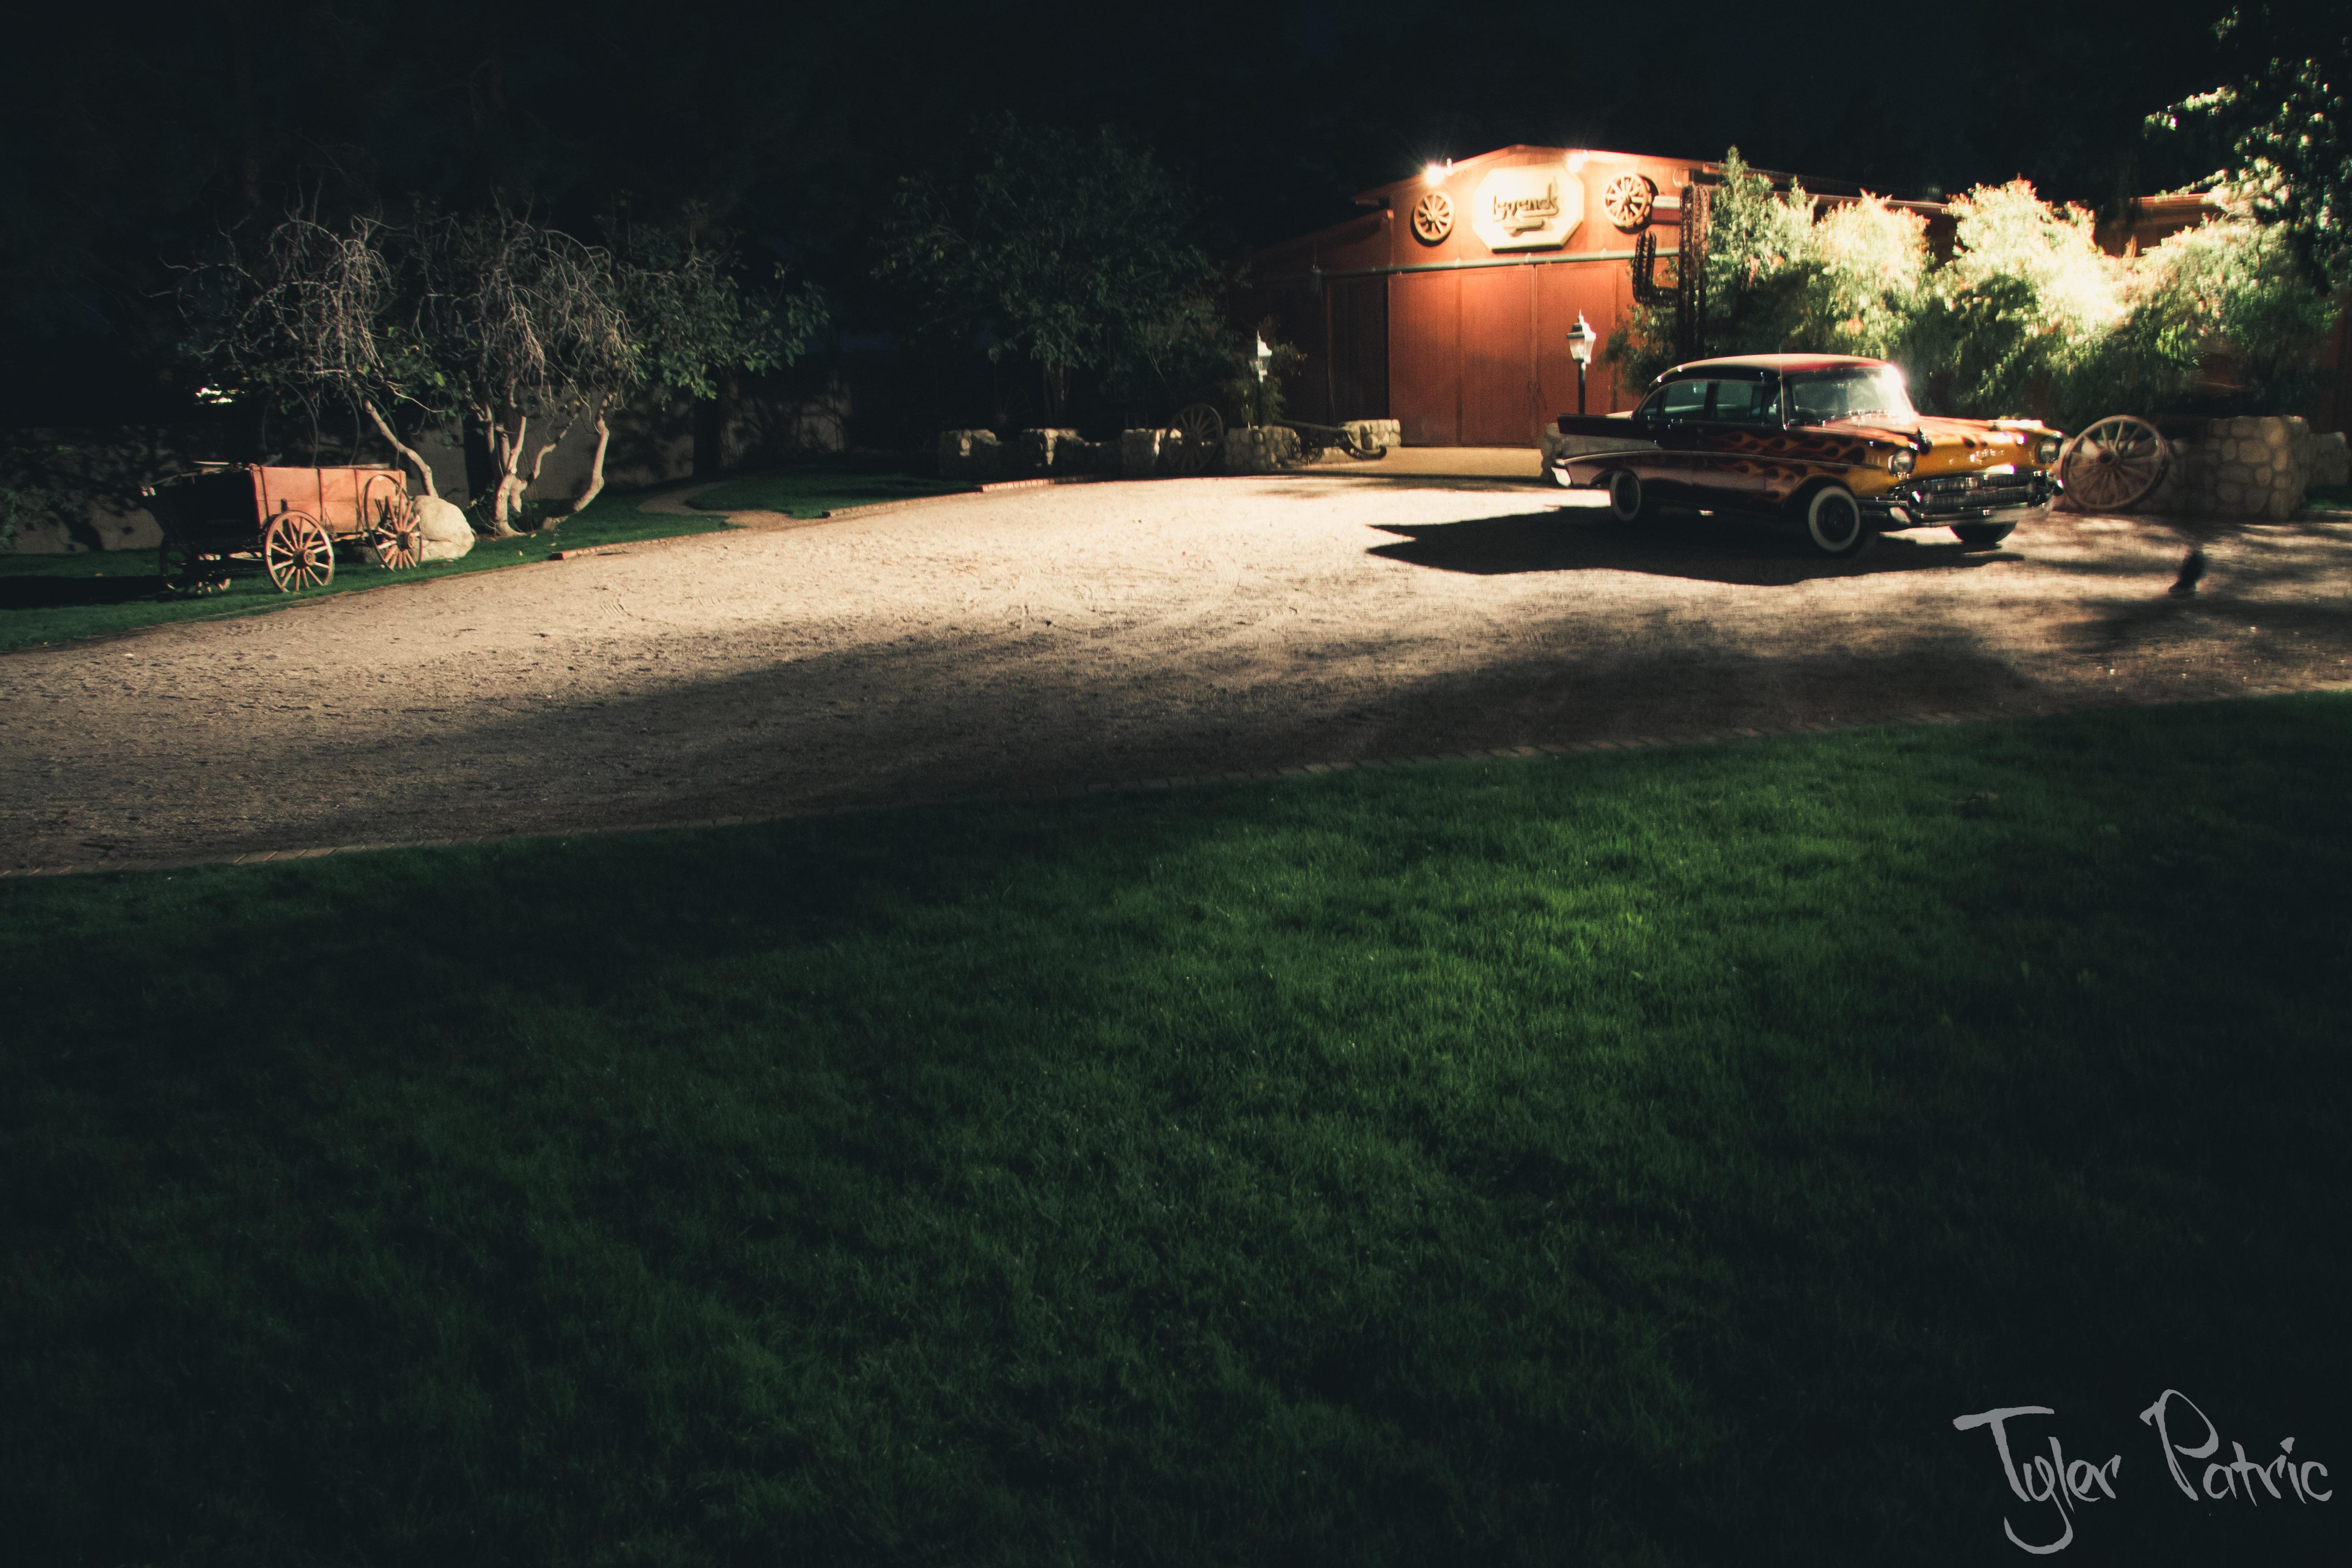 ranch las vegas-7.jpg